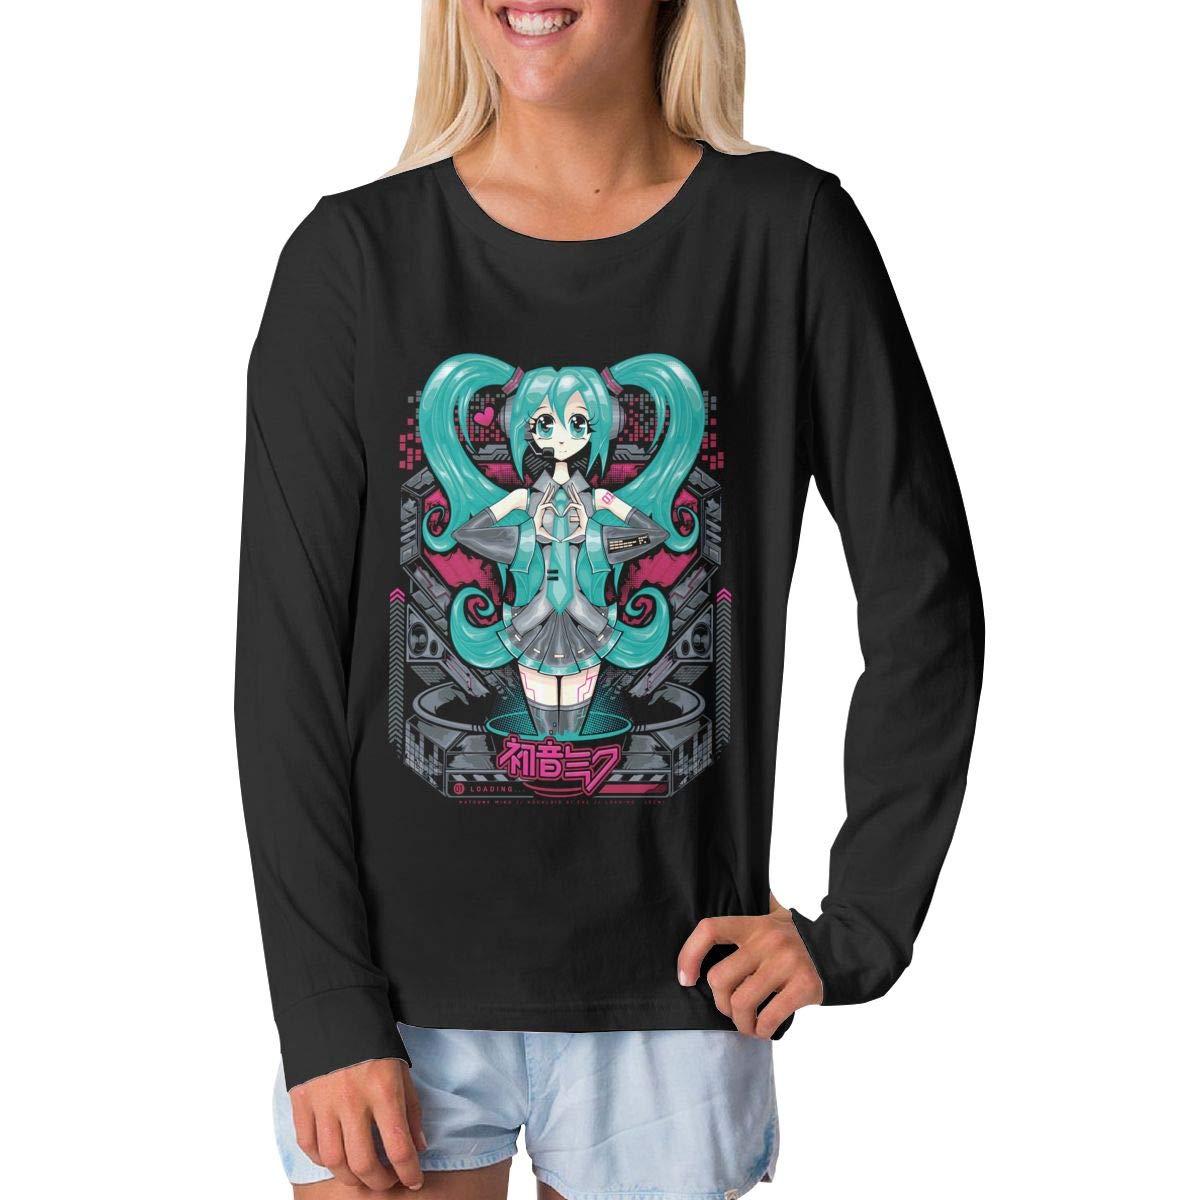 BilliePhillips Youth Hatsune Miku Classic Long Sleeve Tee Shirt